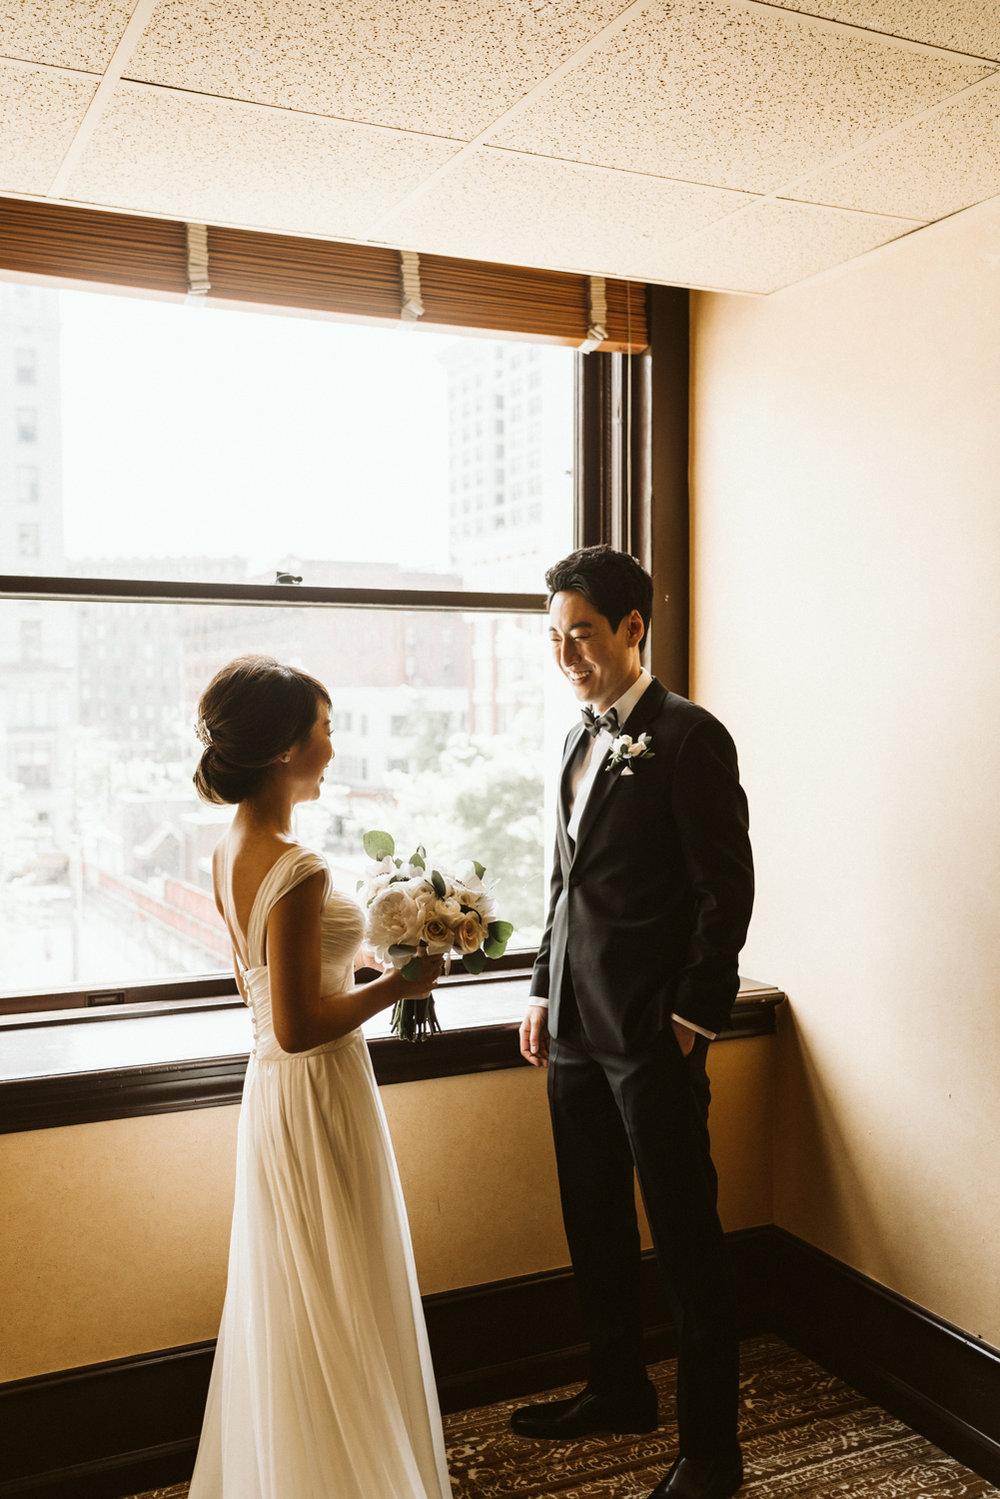 April Yentas Photography - Kristen & Jeff Wedding-12.jpg